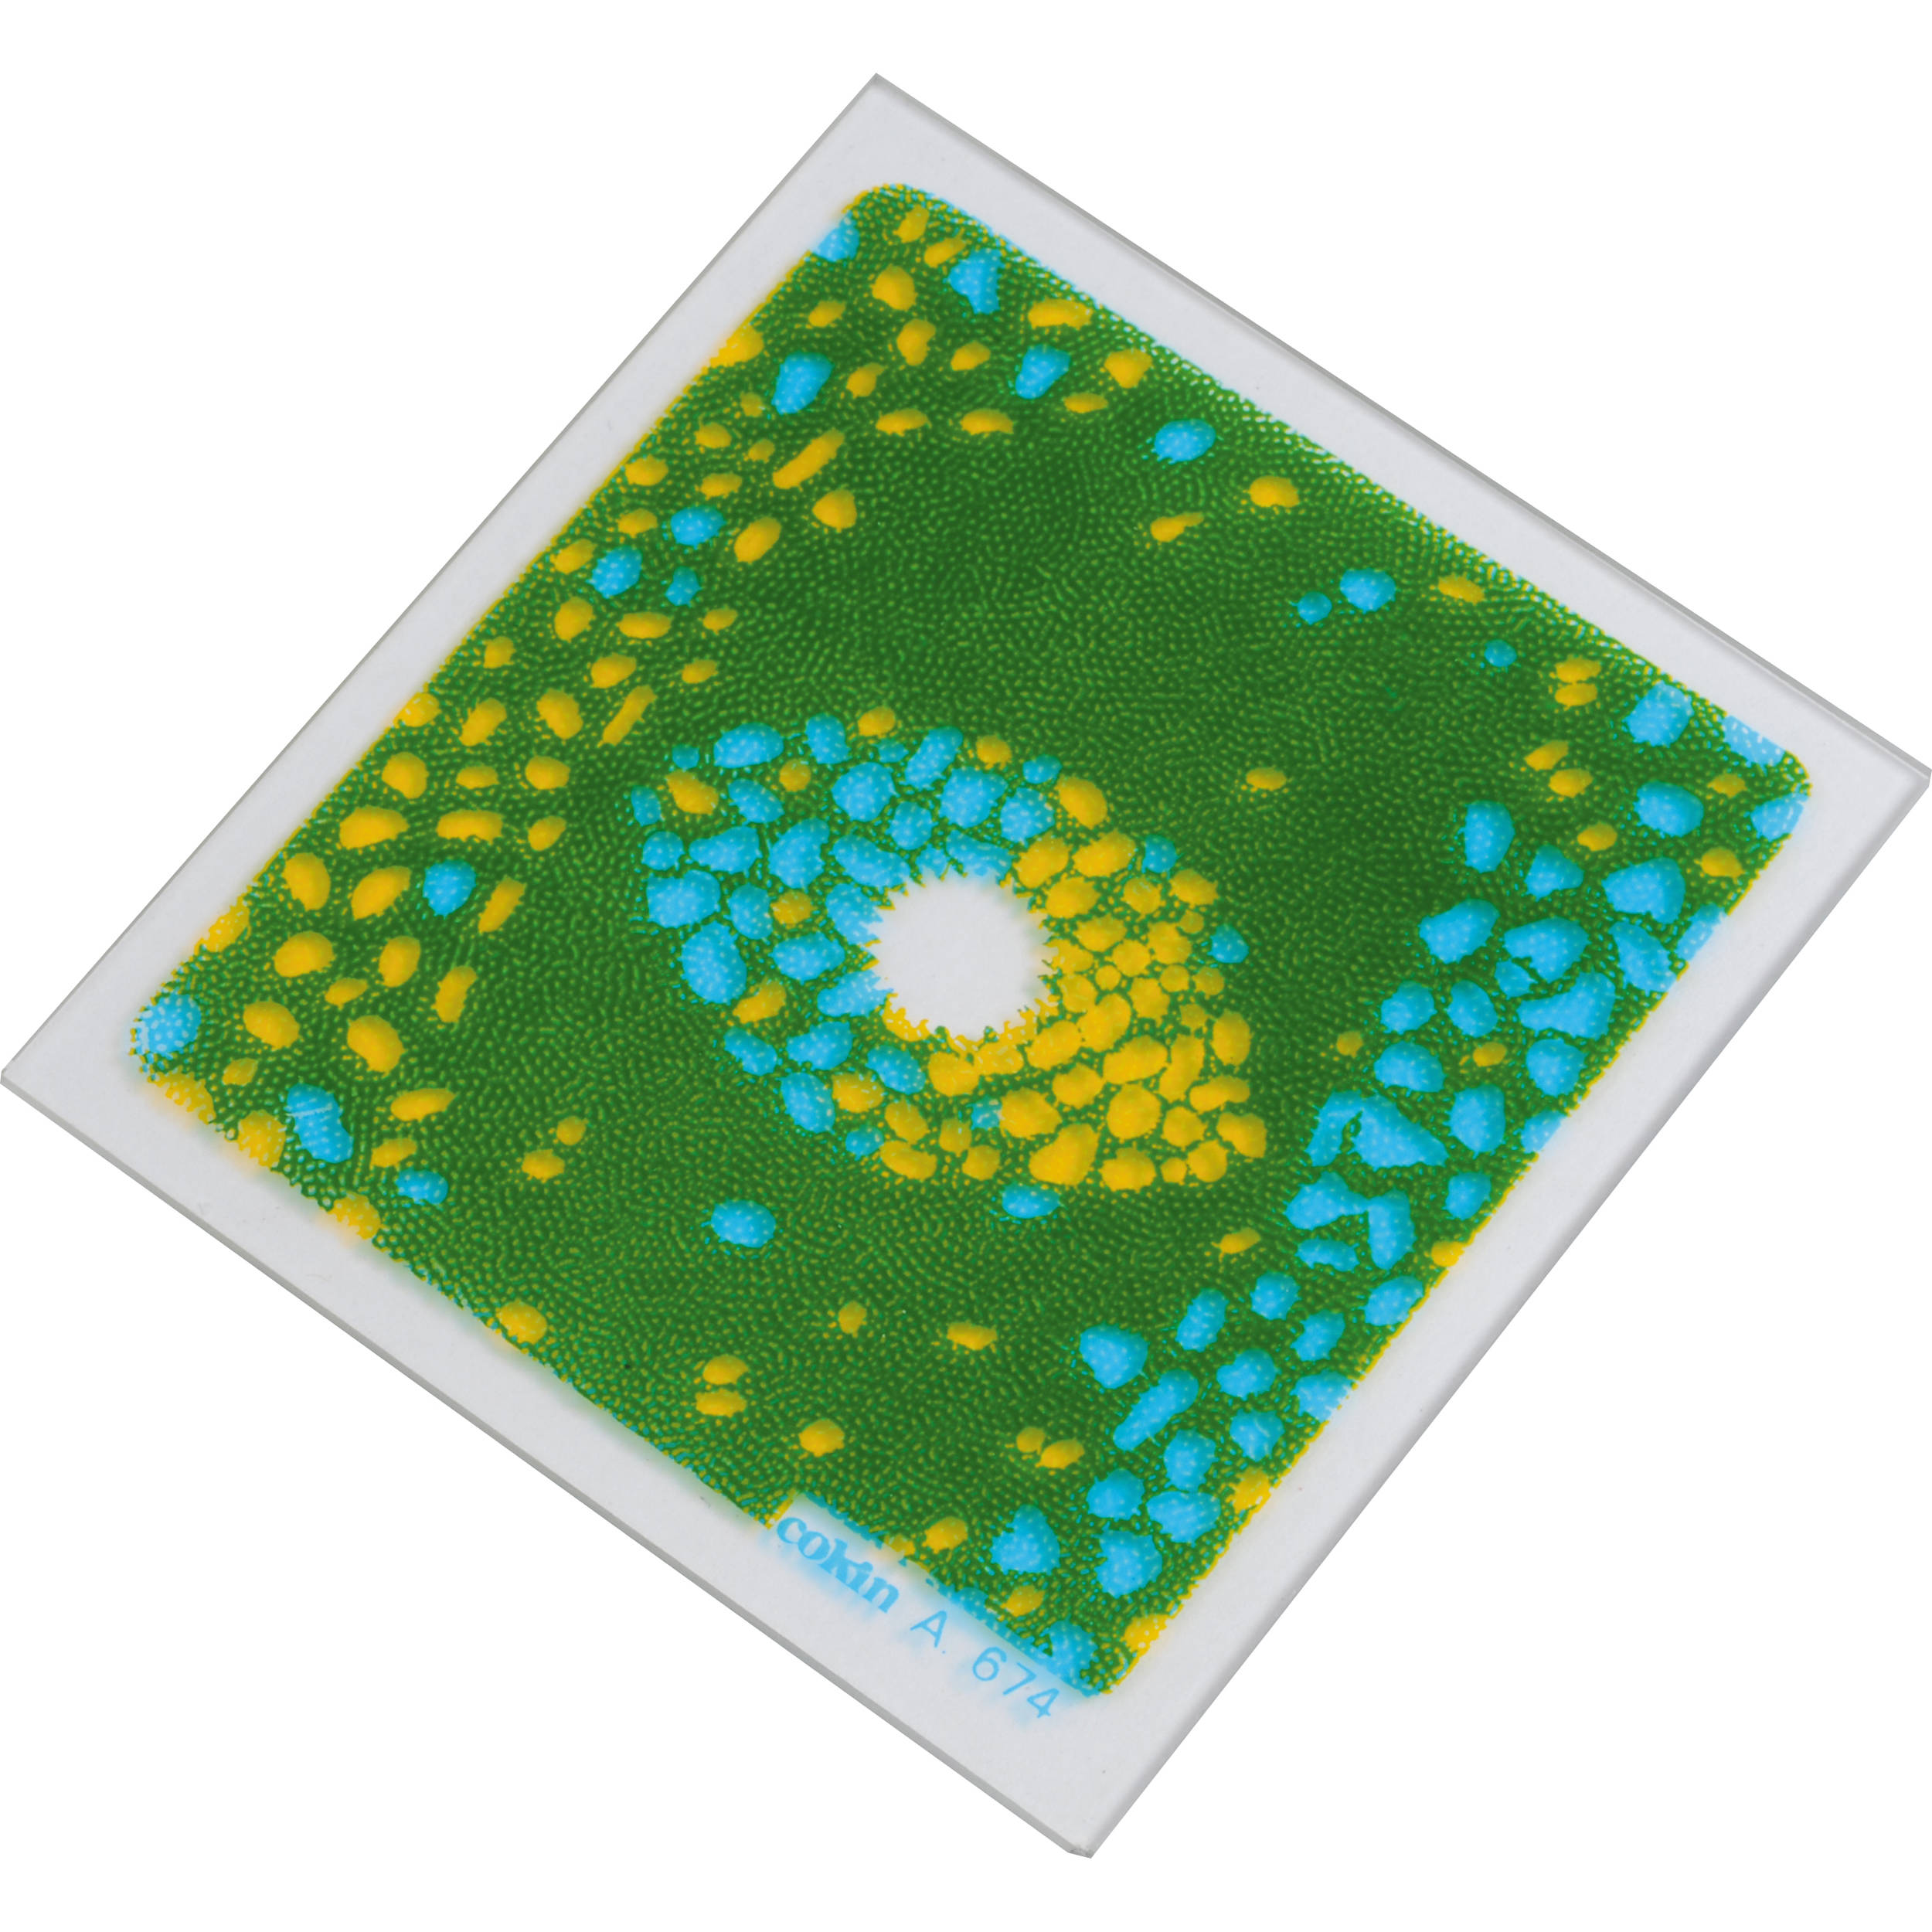 Blue//yellow Bi-color C.sp Cokin A674 Filter A